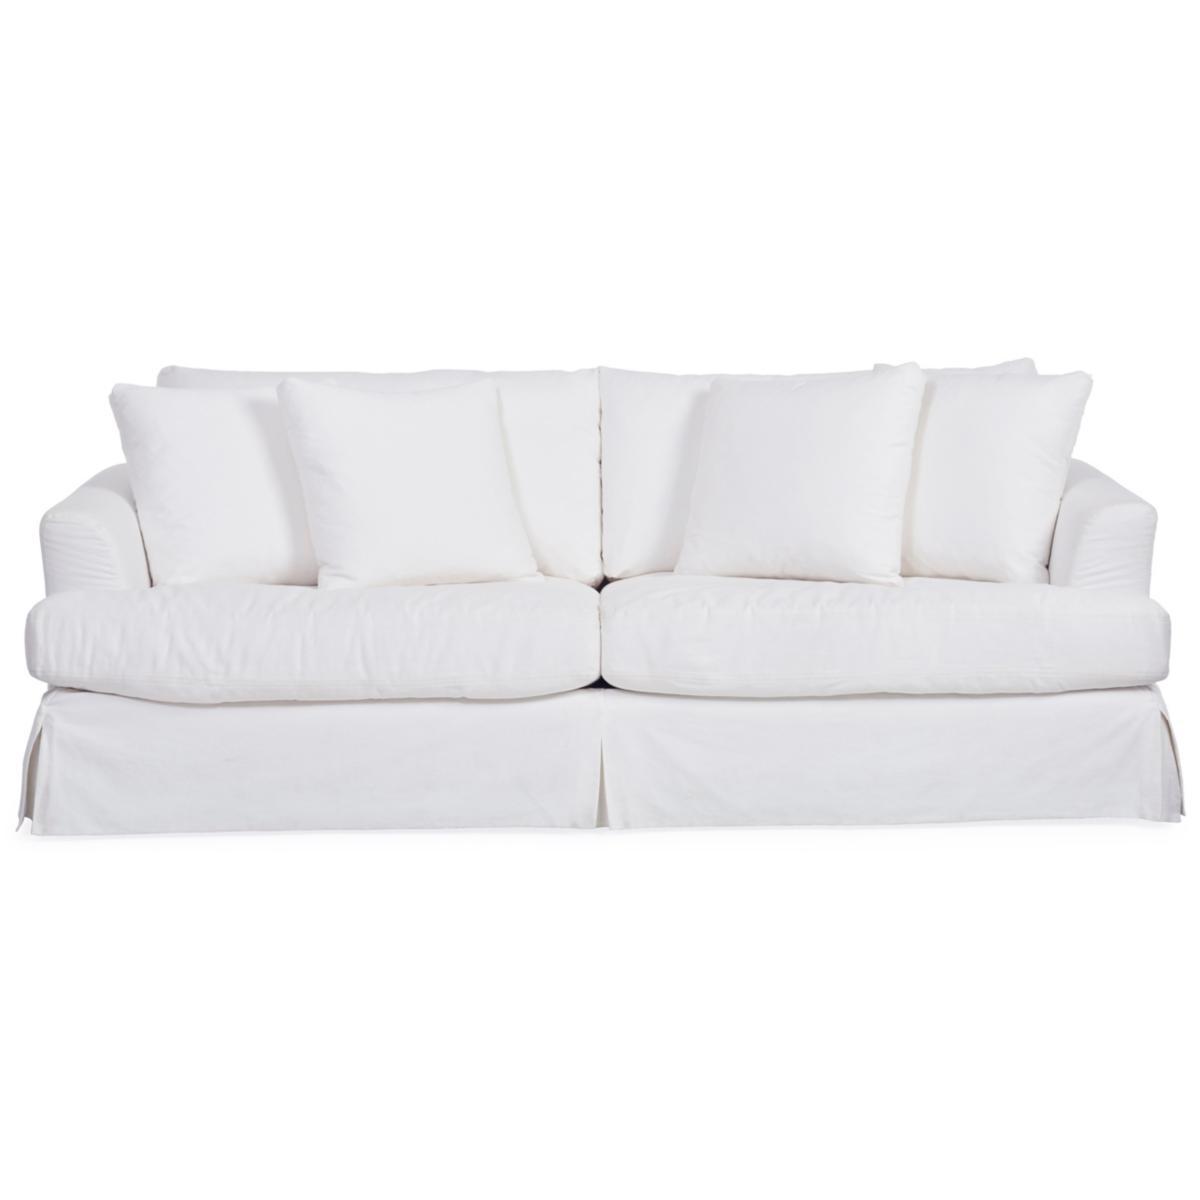 Lily Slipcovered Sofa White Star